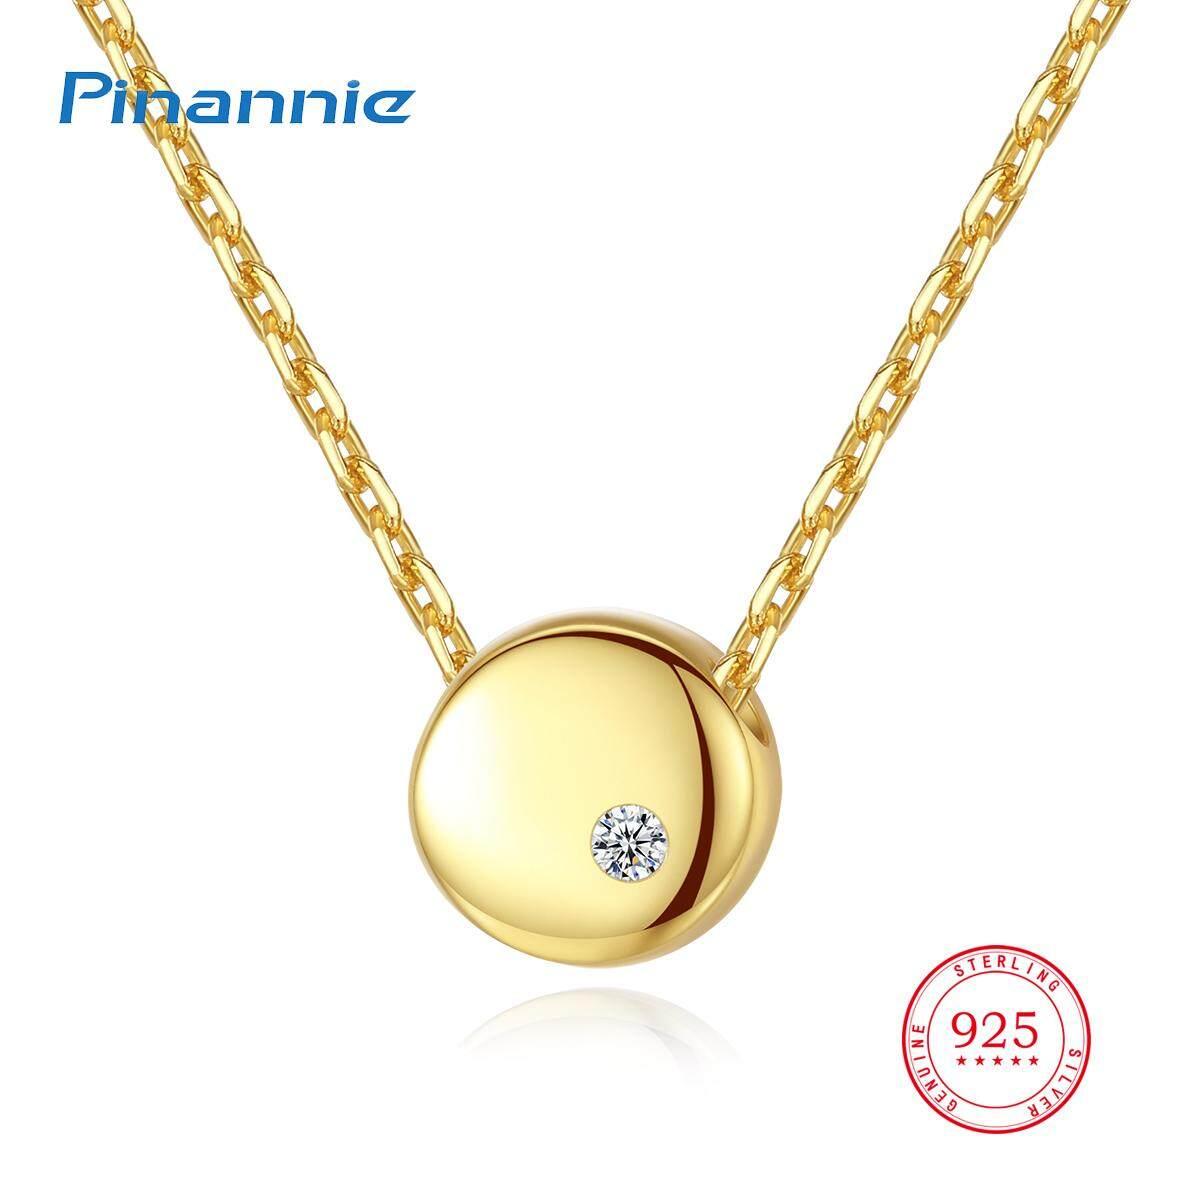 Pinannie AAA Kelas Zirkon Perhiasan Asli 925 Sterling Perak Kalung untuk Wanita